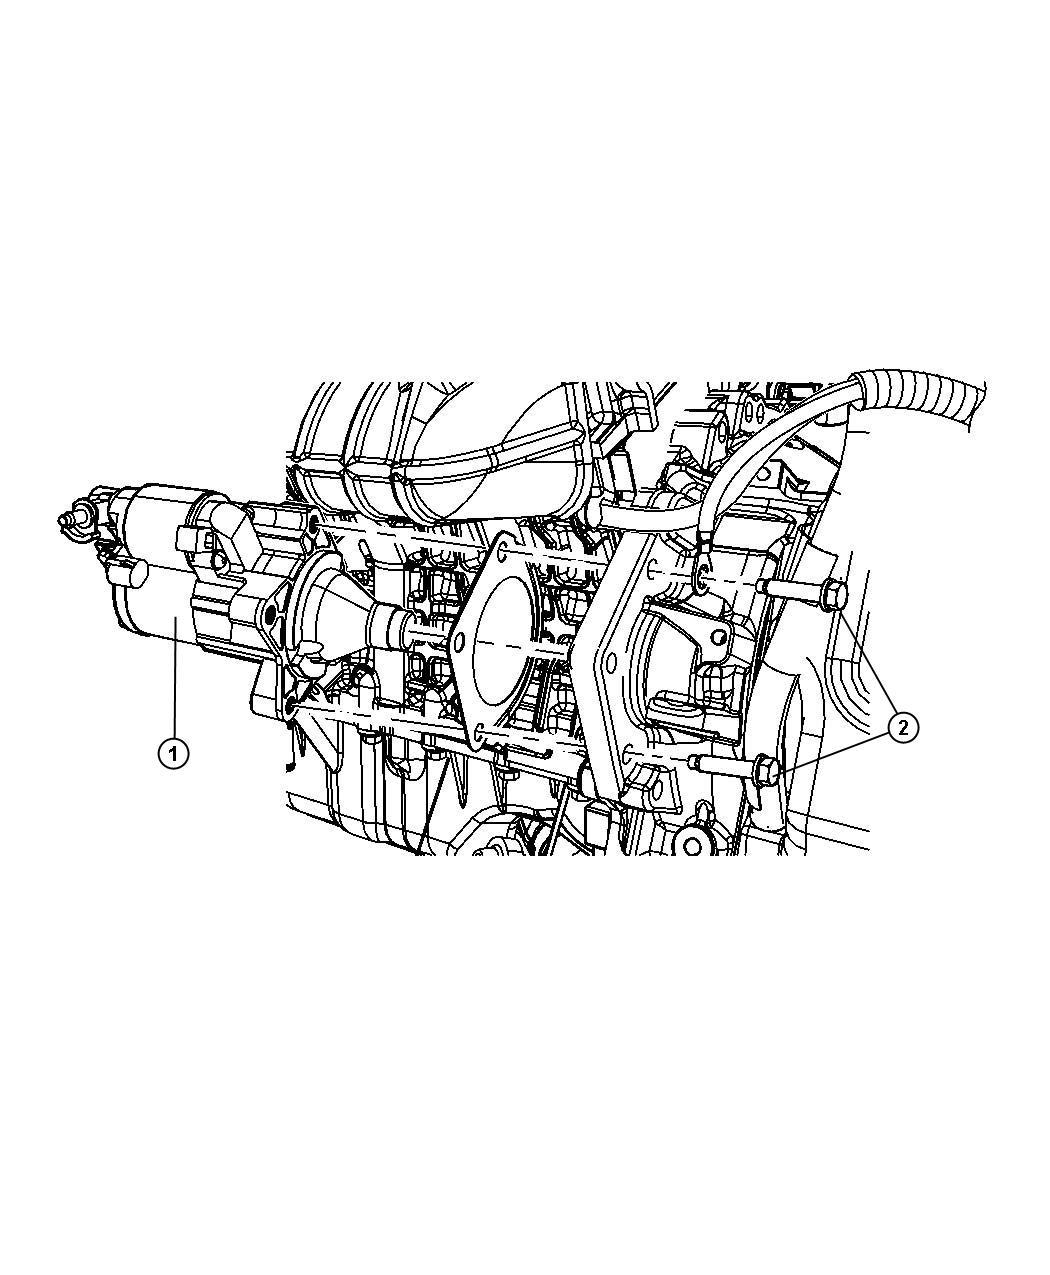 2012 Dodge Journey Starter. Engine. New part for core